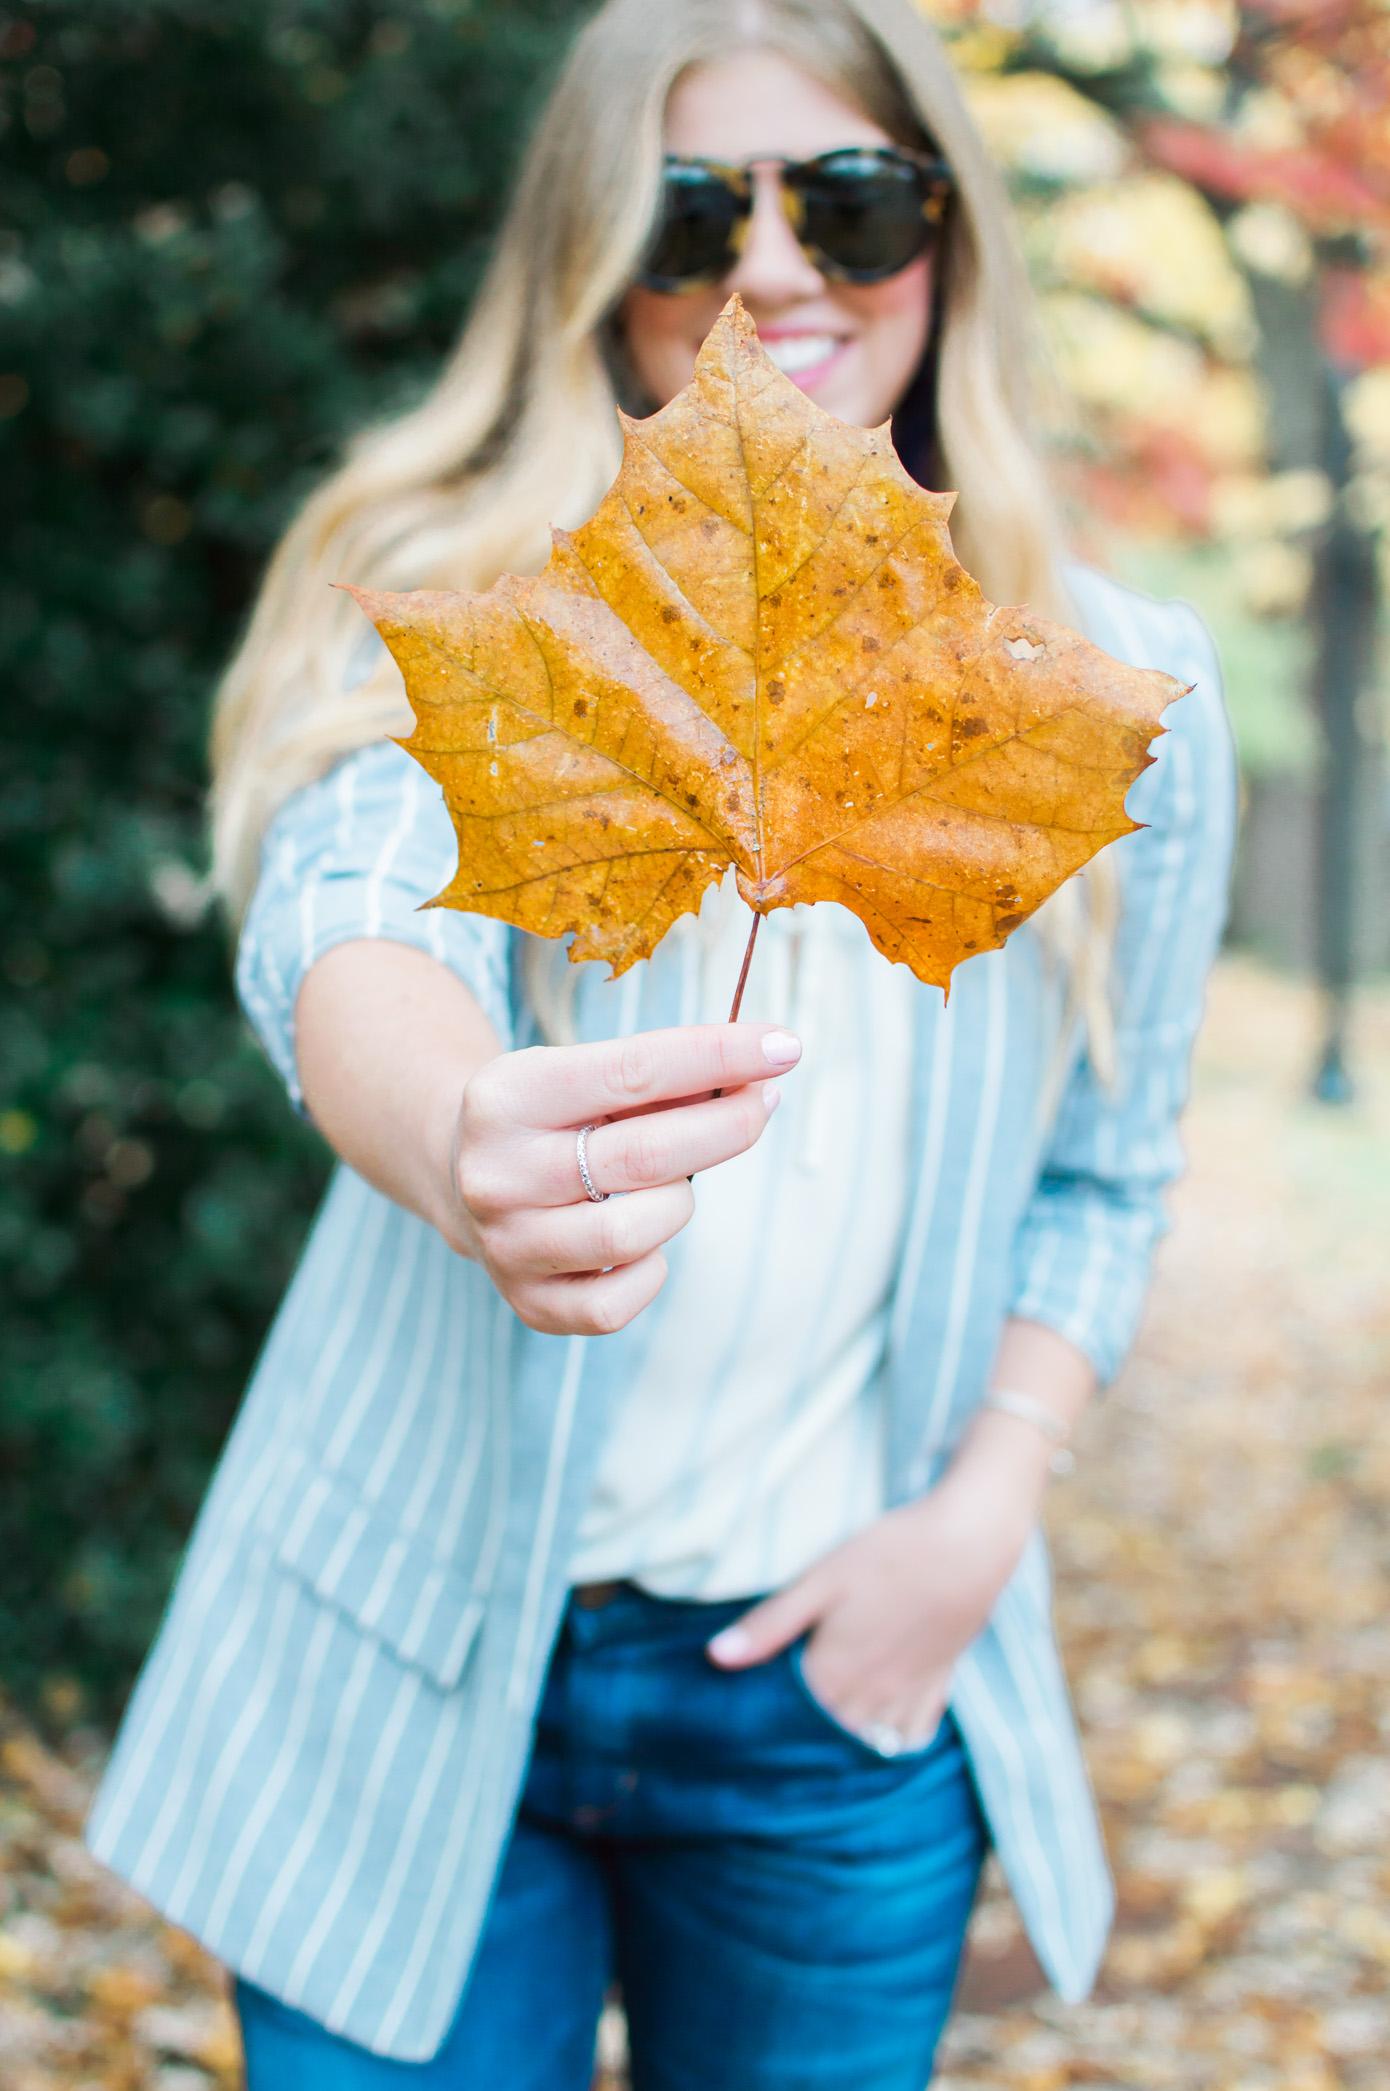 Fall Boyfriend Jeans | Striped Boyfriend Blazer | Louella Reese Life & Style Blog